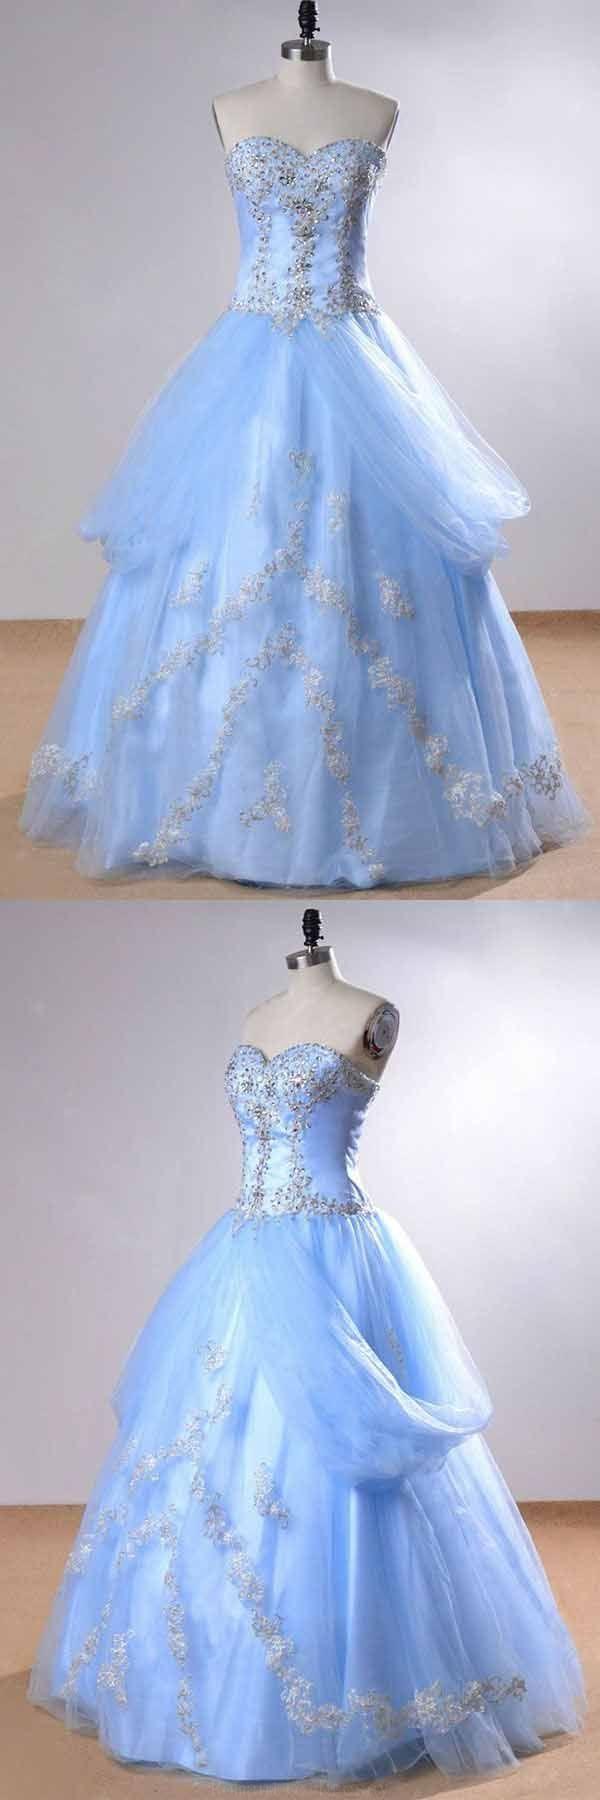 Blue wedding dresses blueweddingdresses light blue wedding dresses